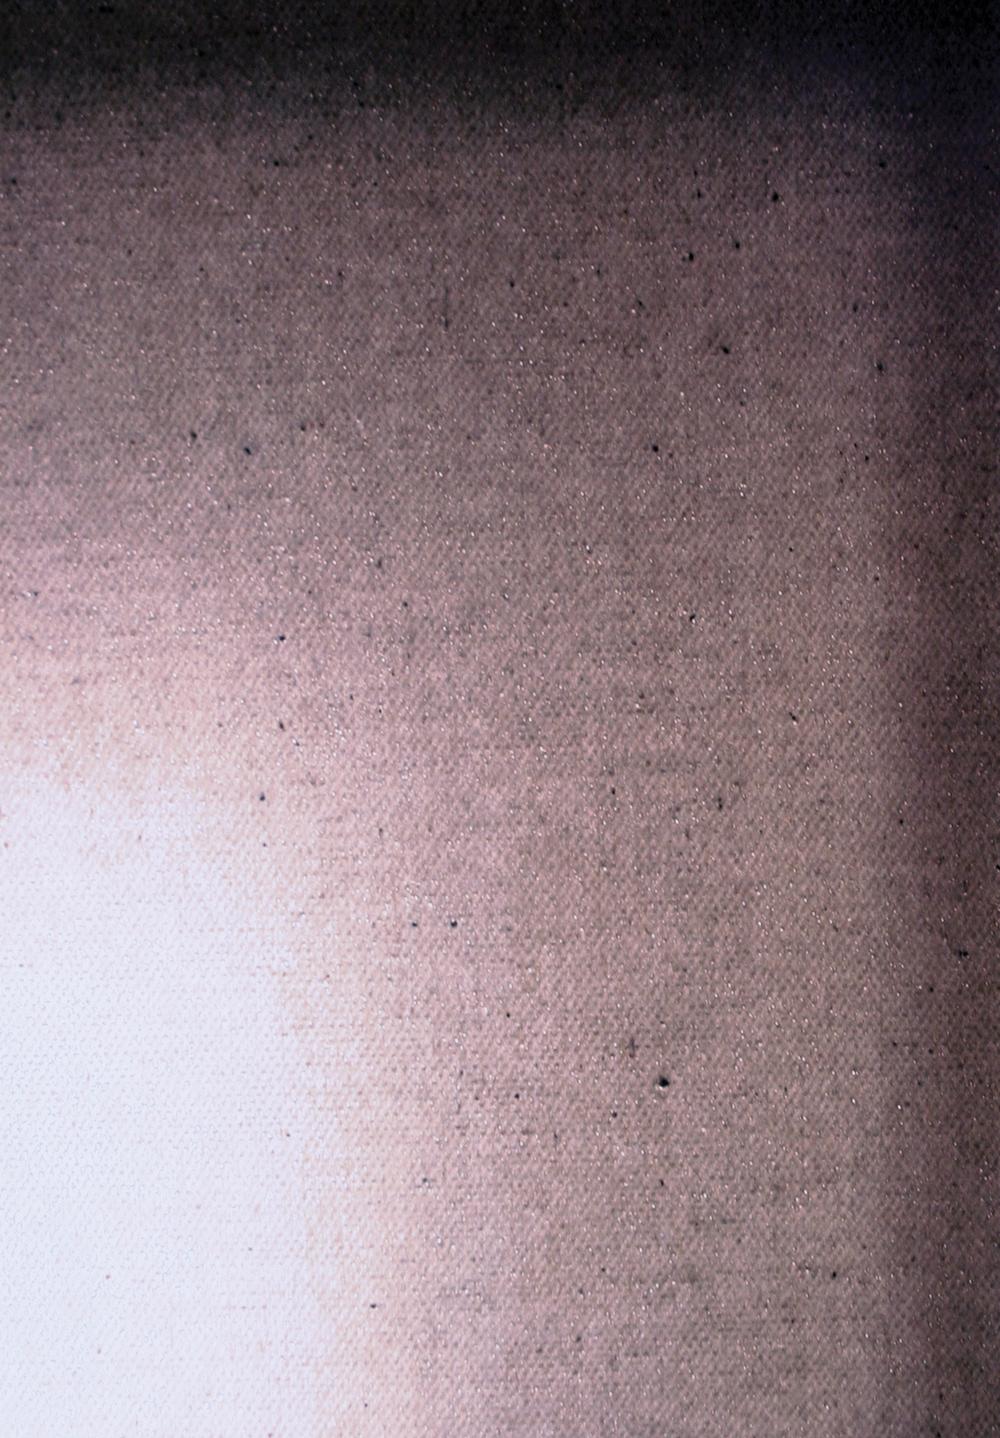 04_Rothko_detail_web.jpg